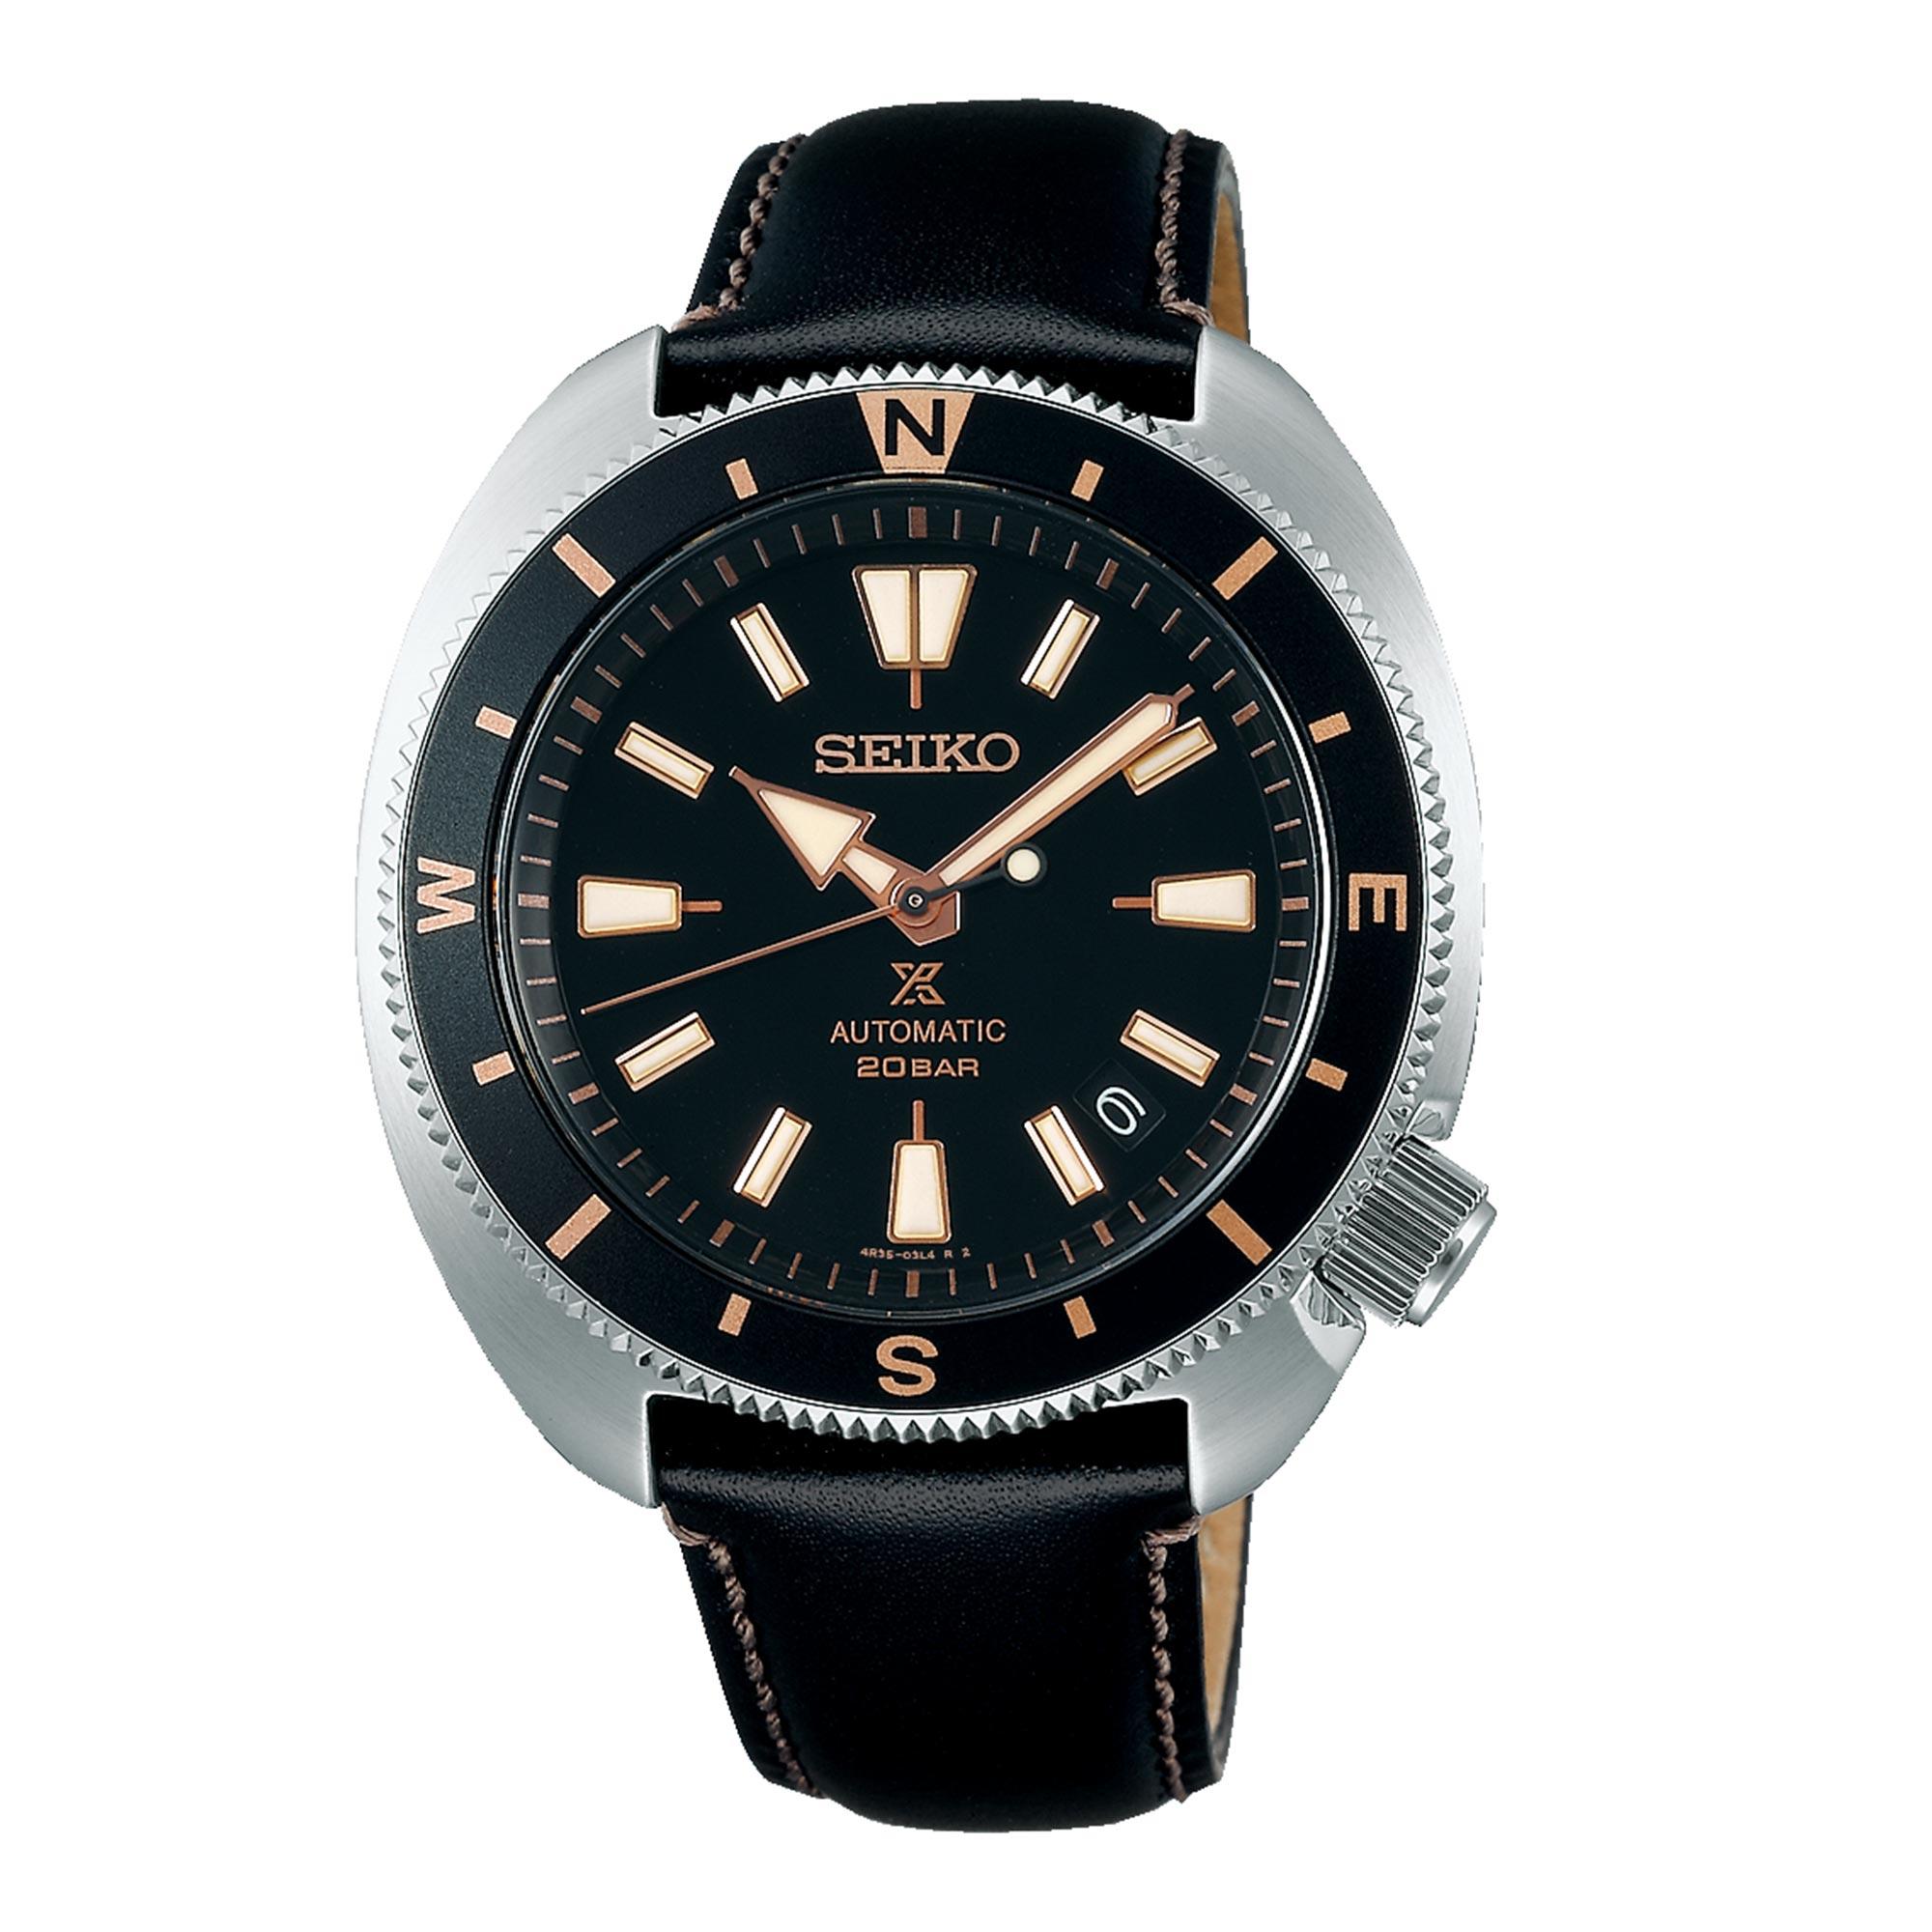 Seiko Prospex Tortoise Automatic Movement Black Dial Leather Bracelet Men's Watch SRPG17K1